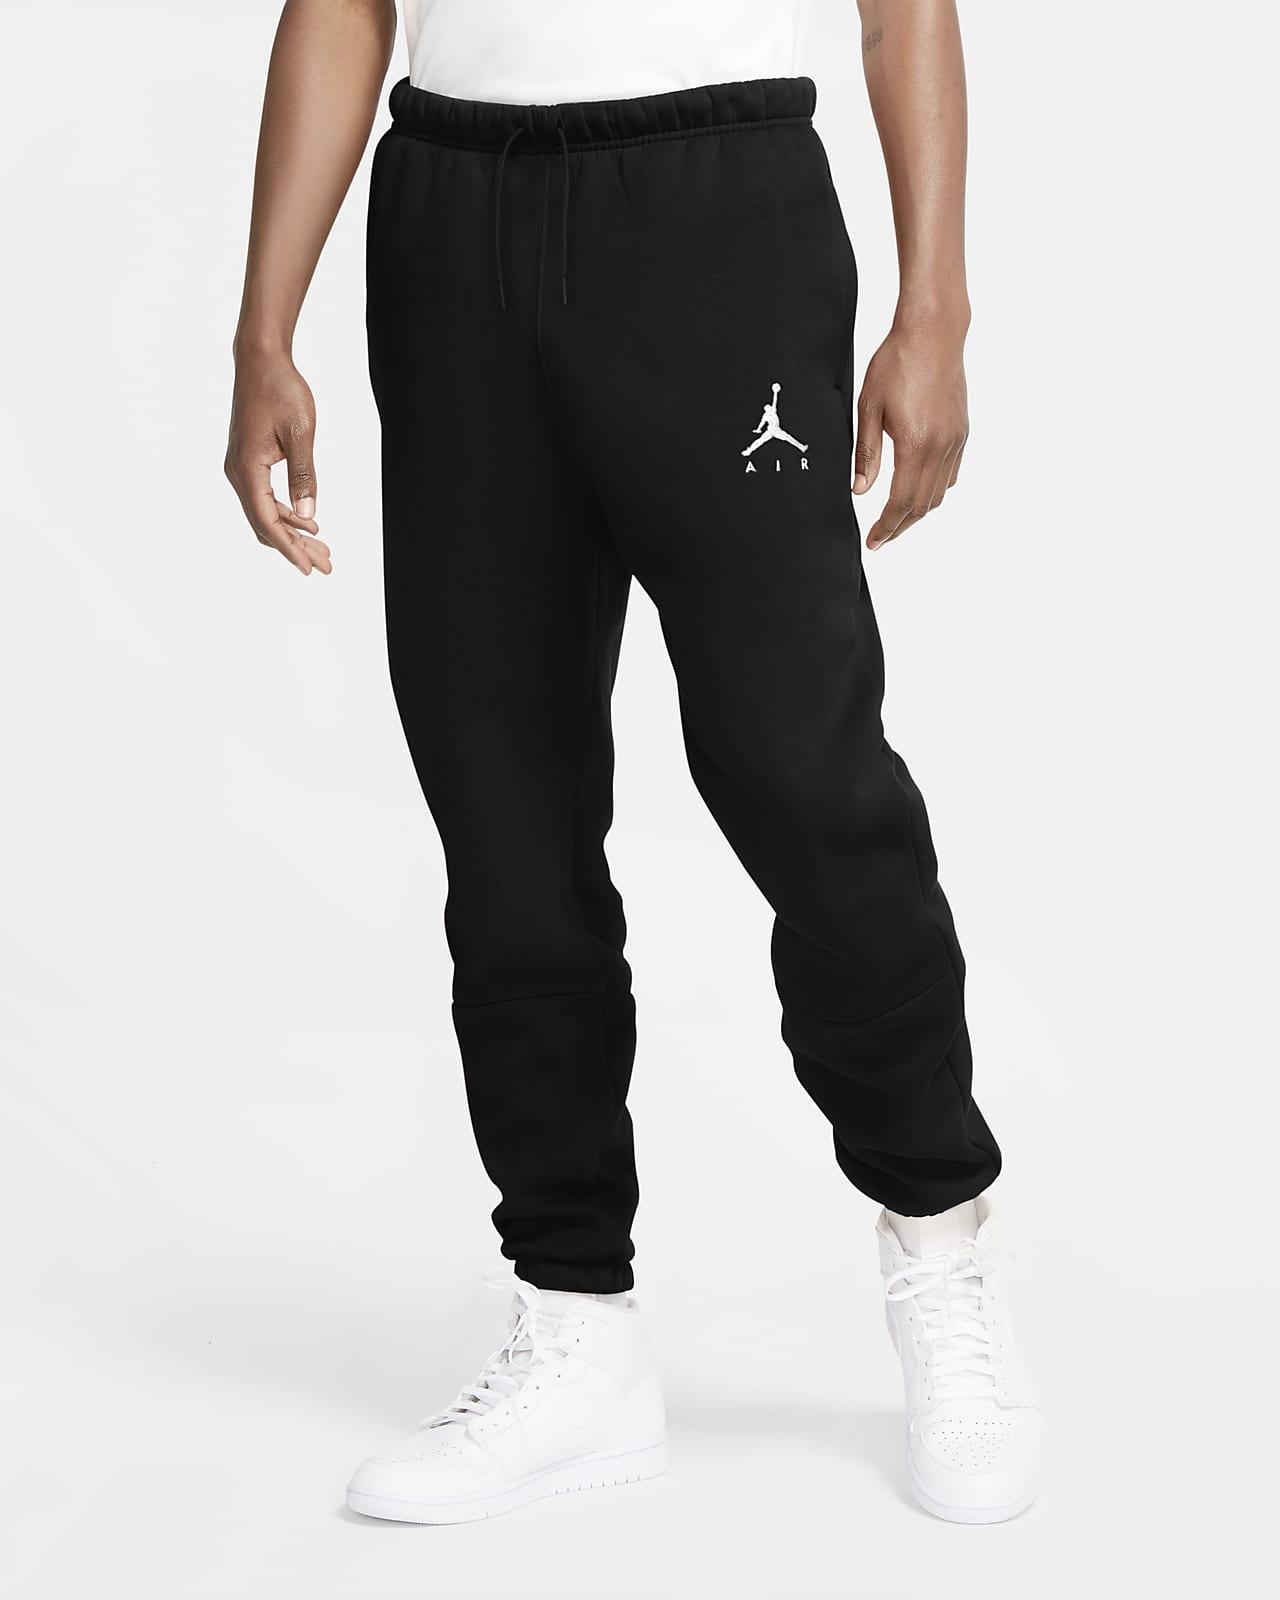 Pantalon Jordan Free Shipping Off68 In Stock